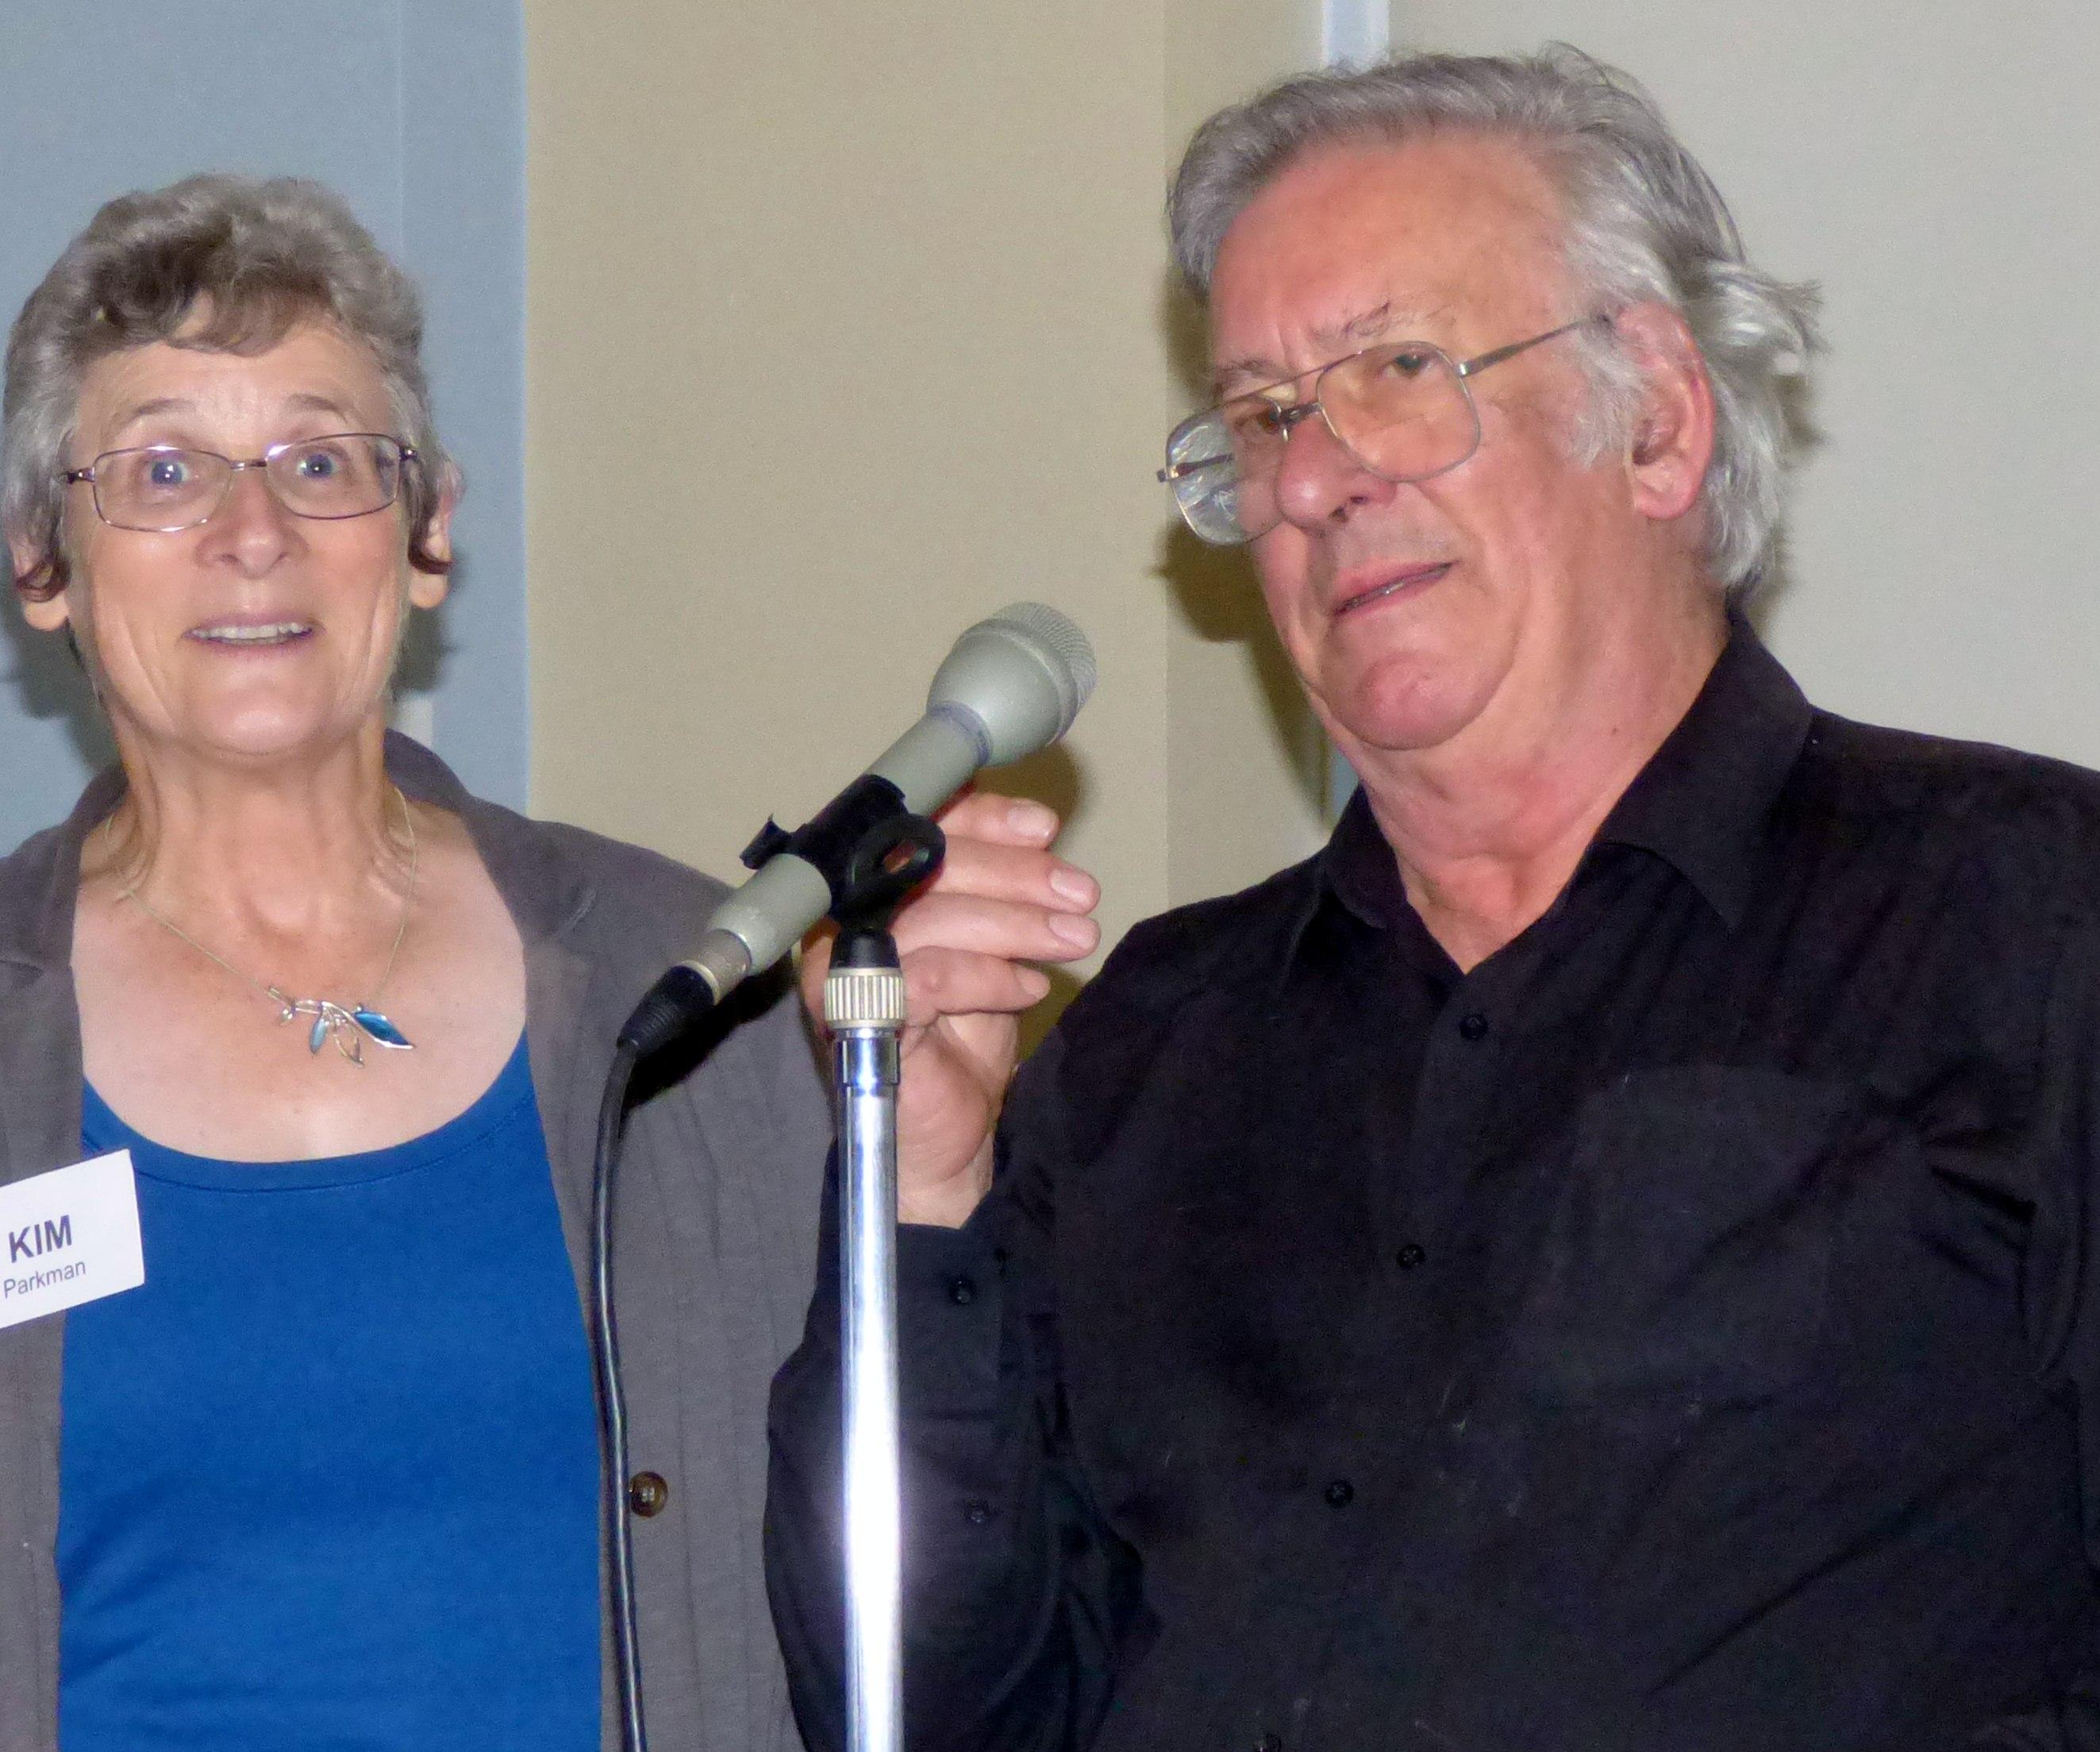 Kim with Richard Box at Merseyside EG, August 2016